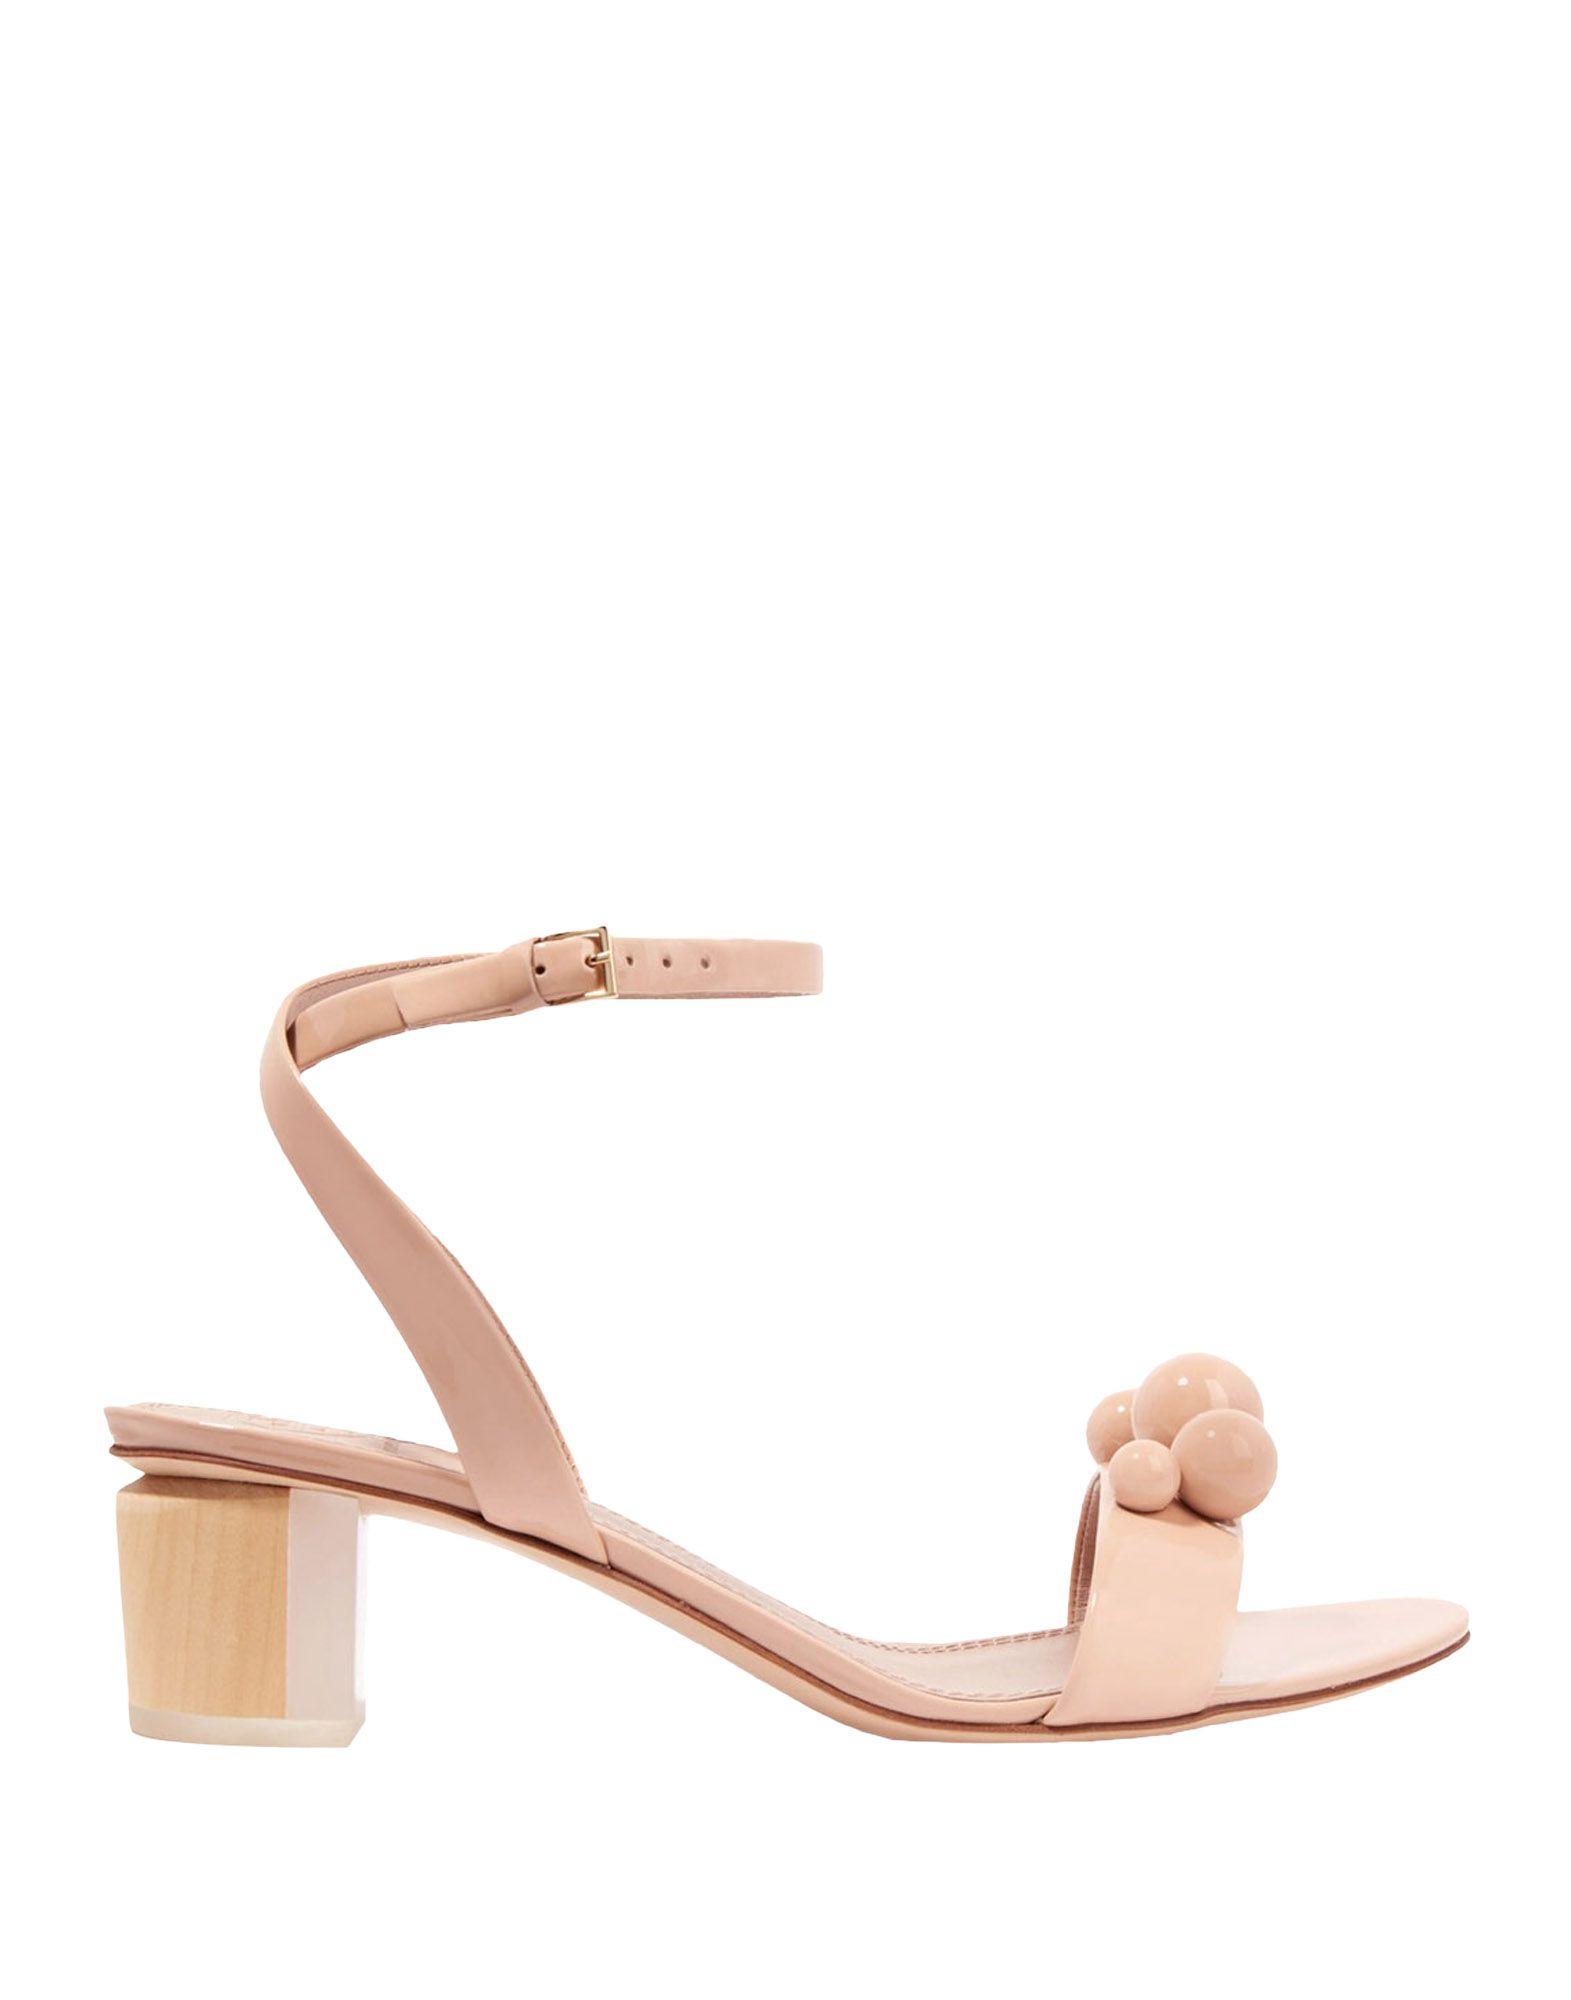 Rabatt Schuhe Schuhe Rabatt Tory Burch Sandalen Damen  11530846LI 3cfcc6